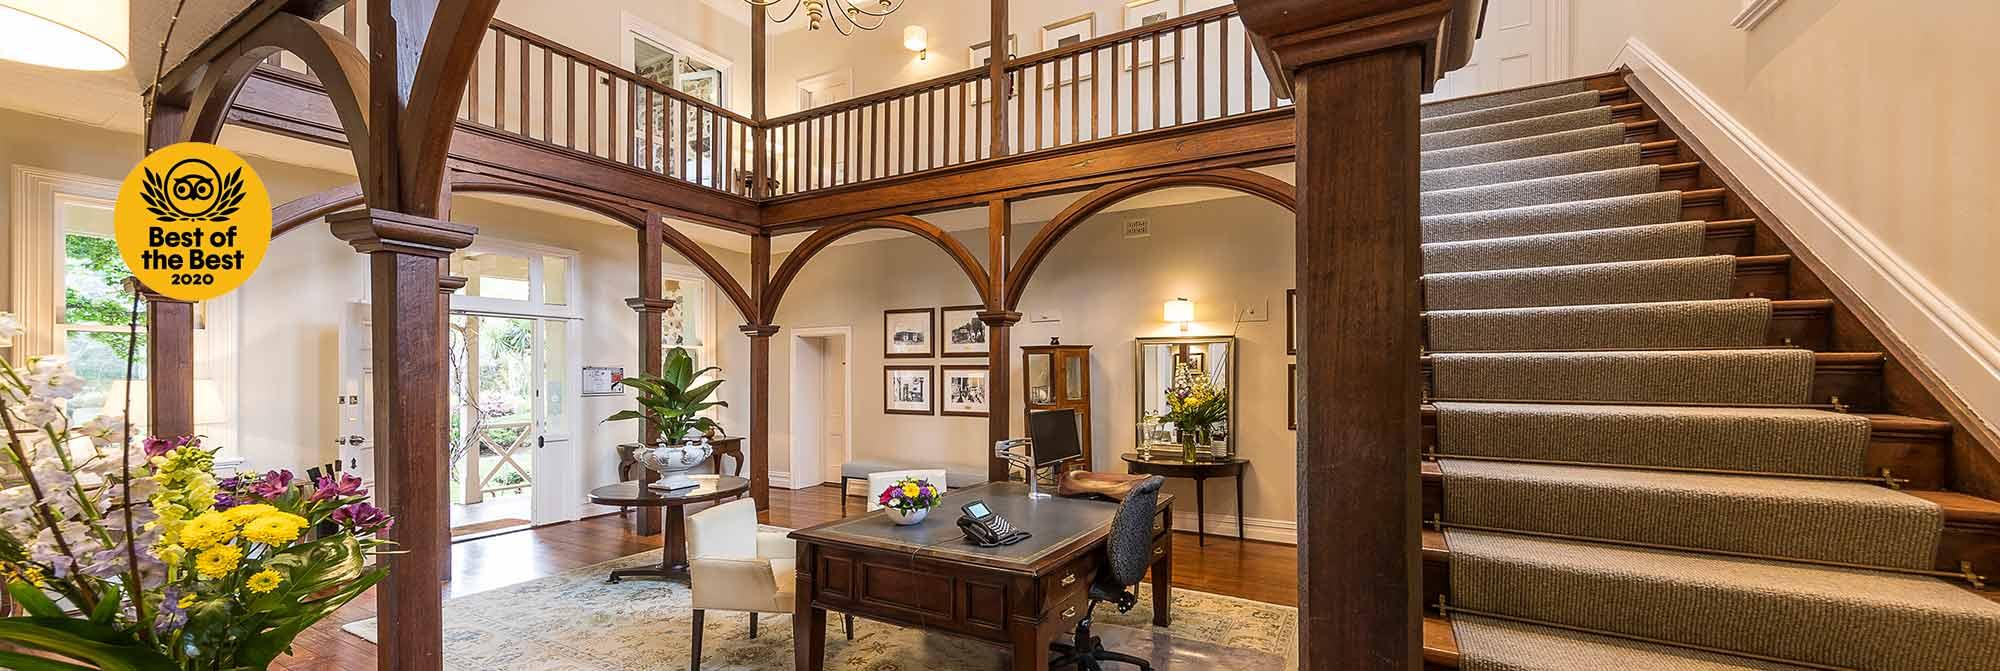 Grand Mercure Basildene Manor